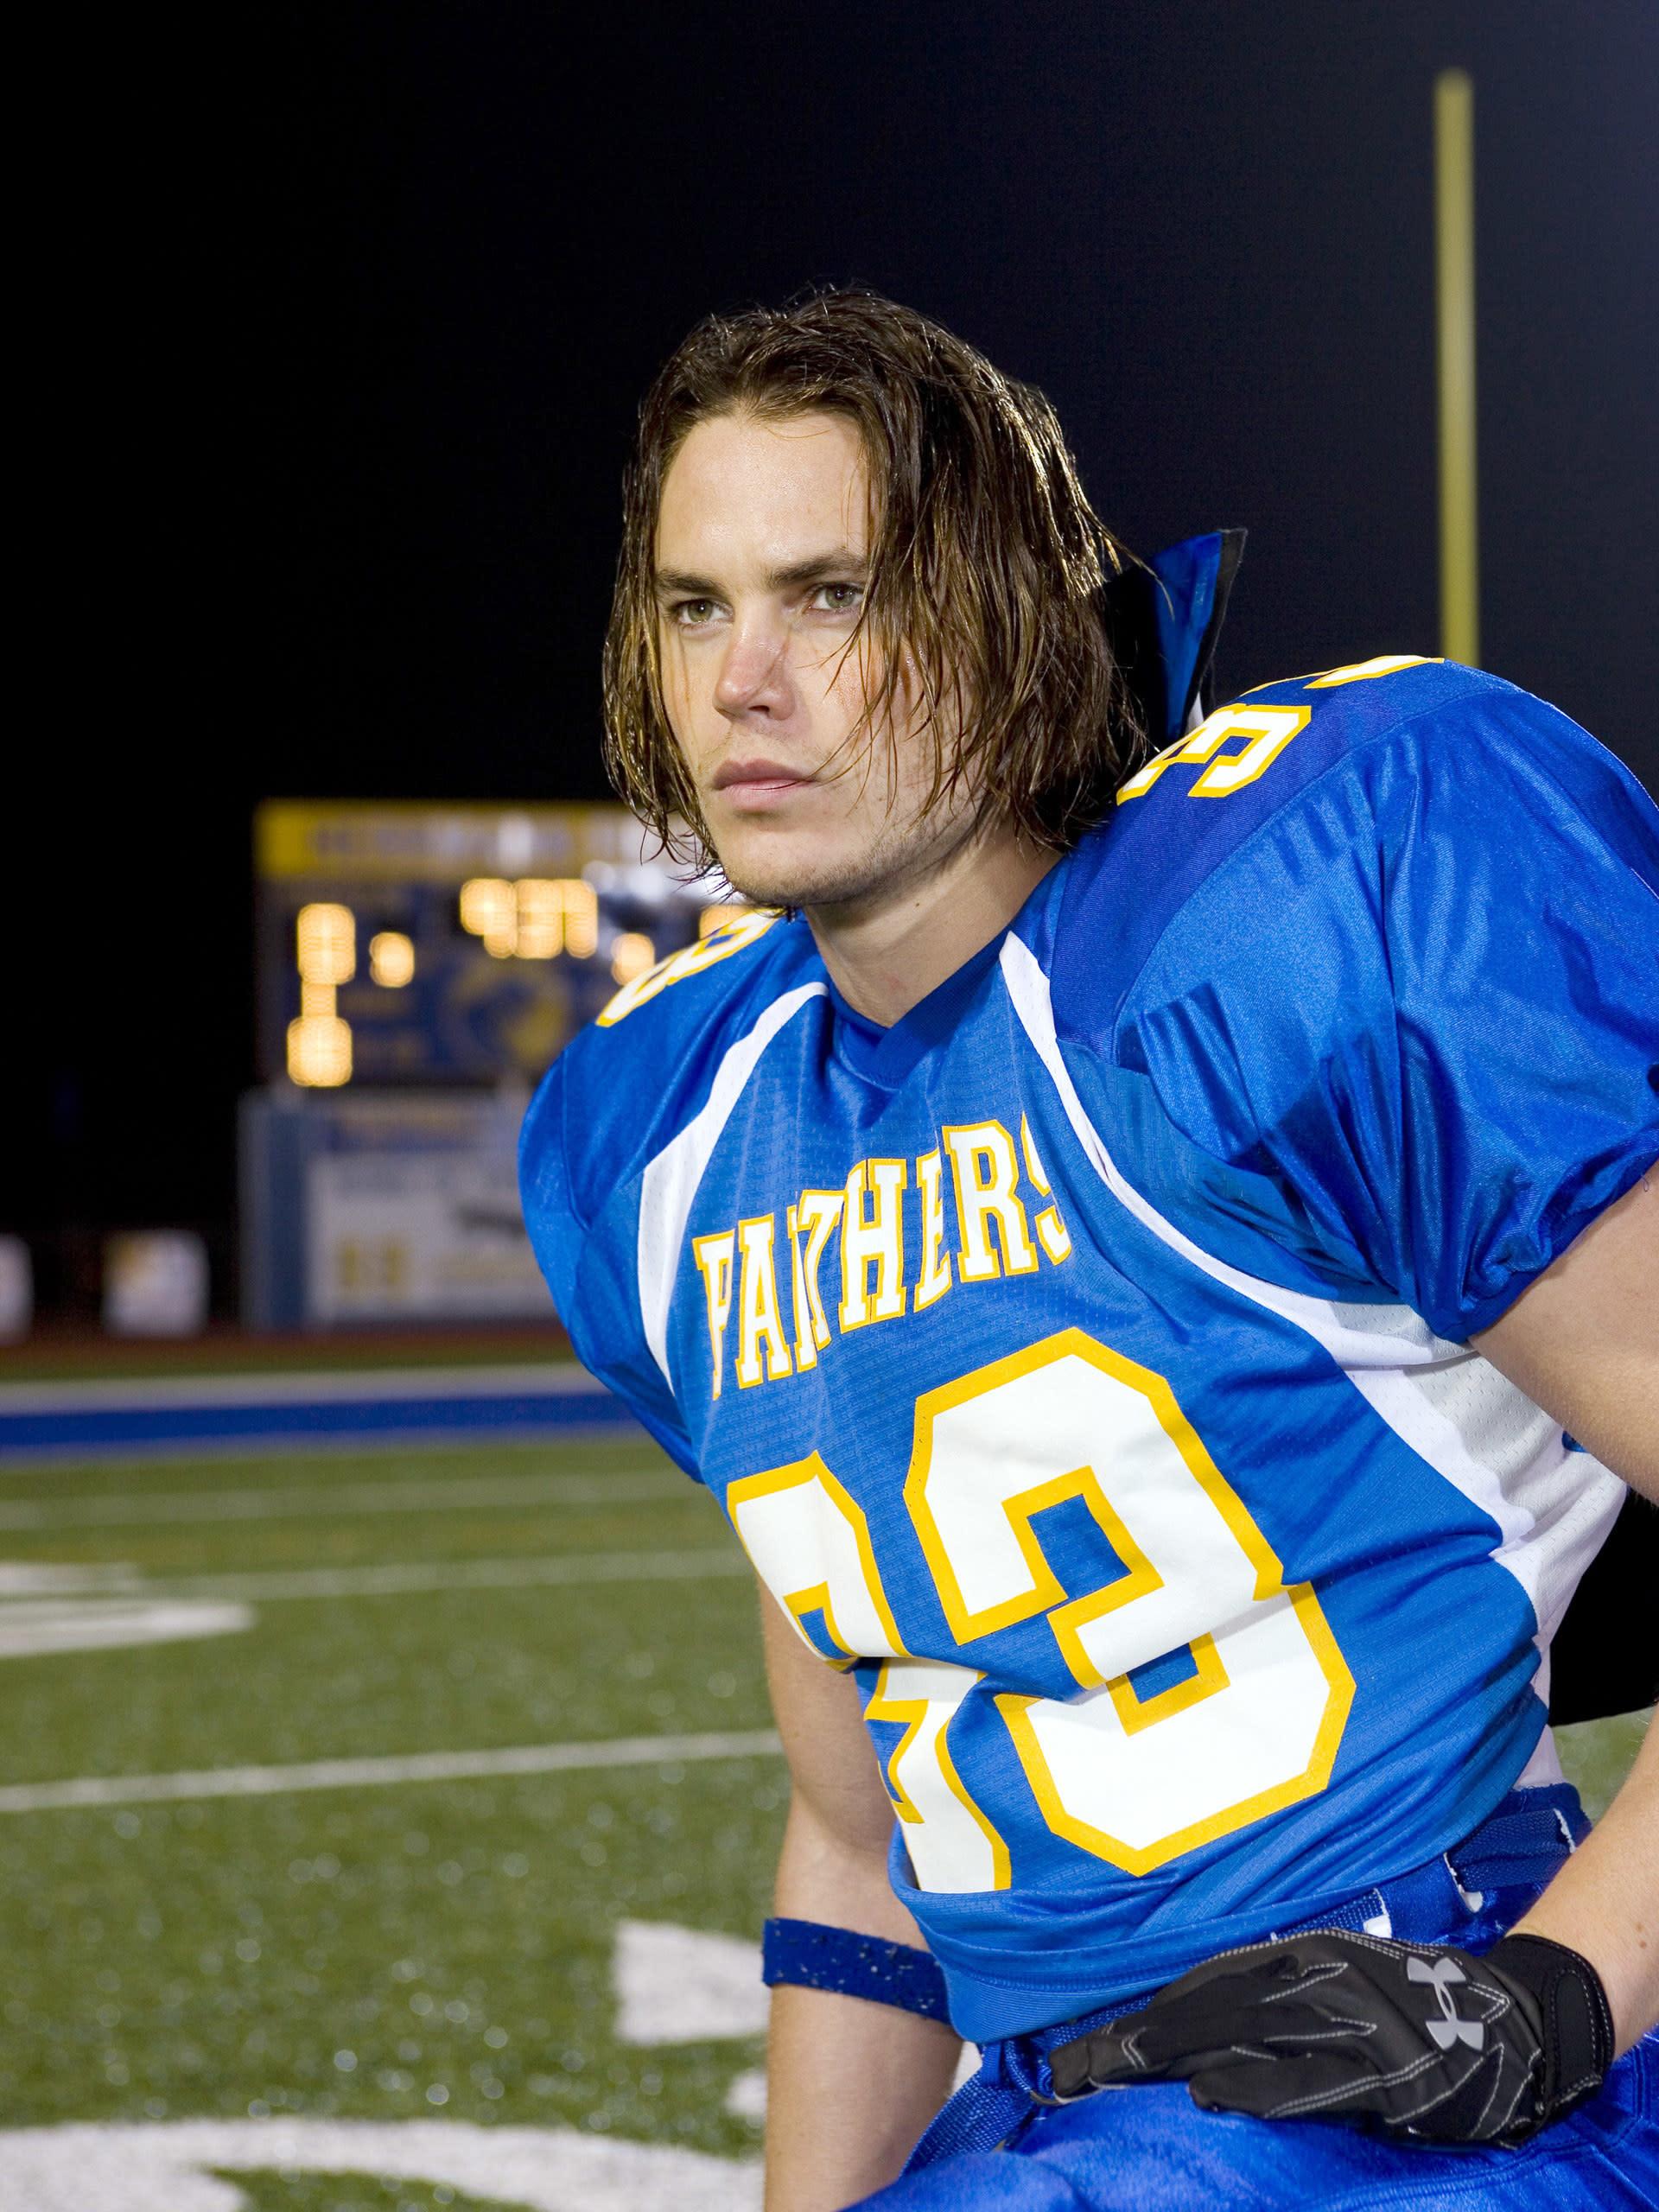 Taylor Kitsch in a football uniform